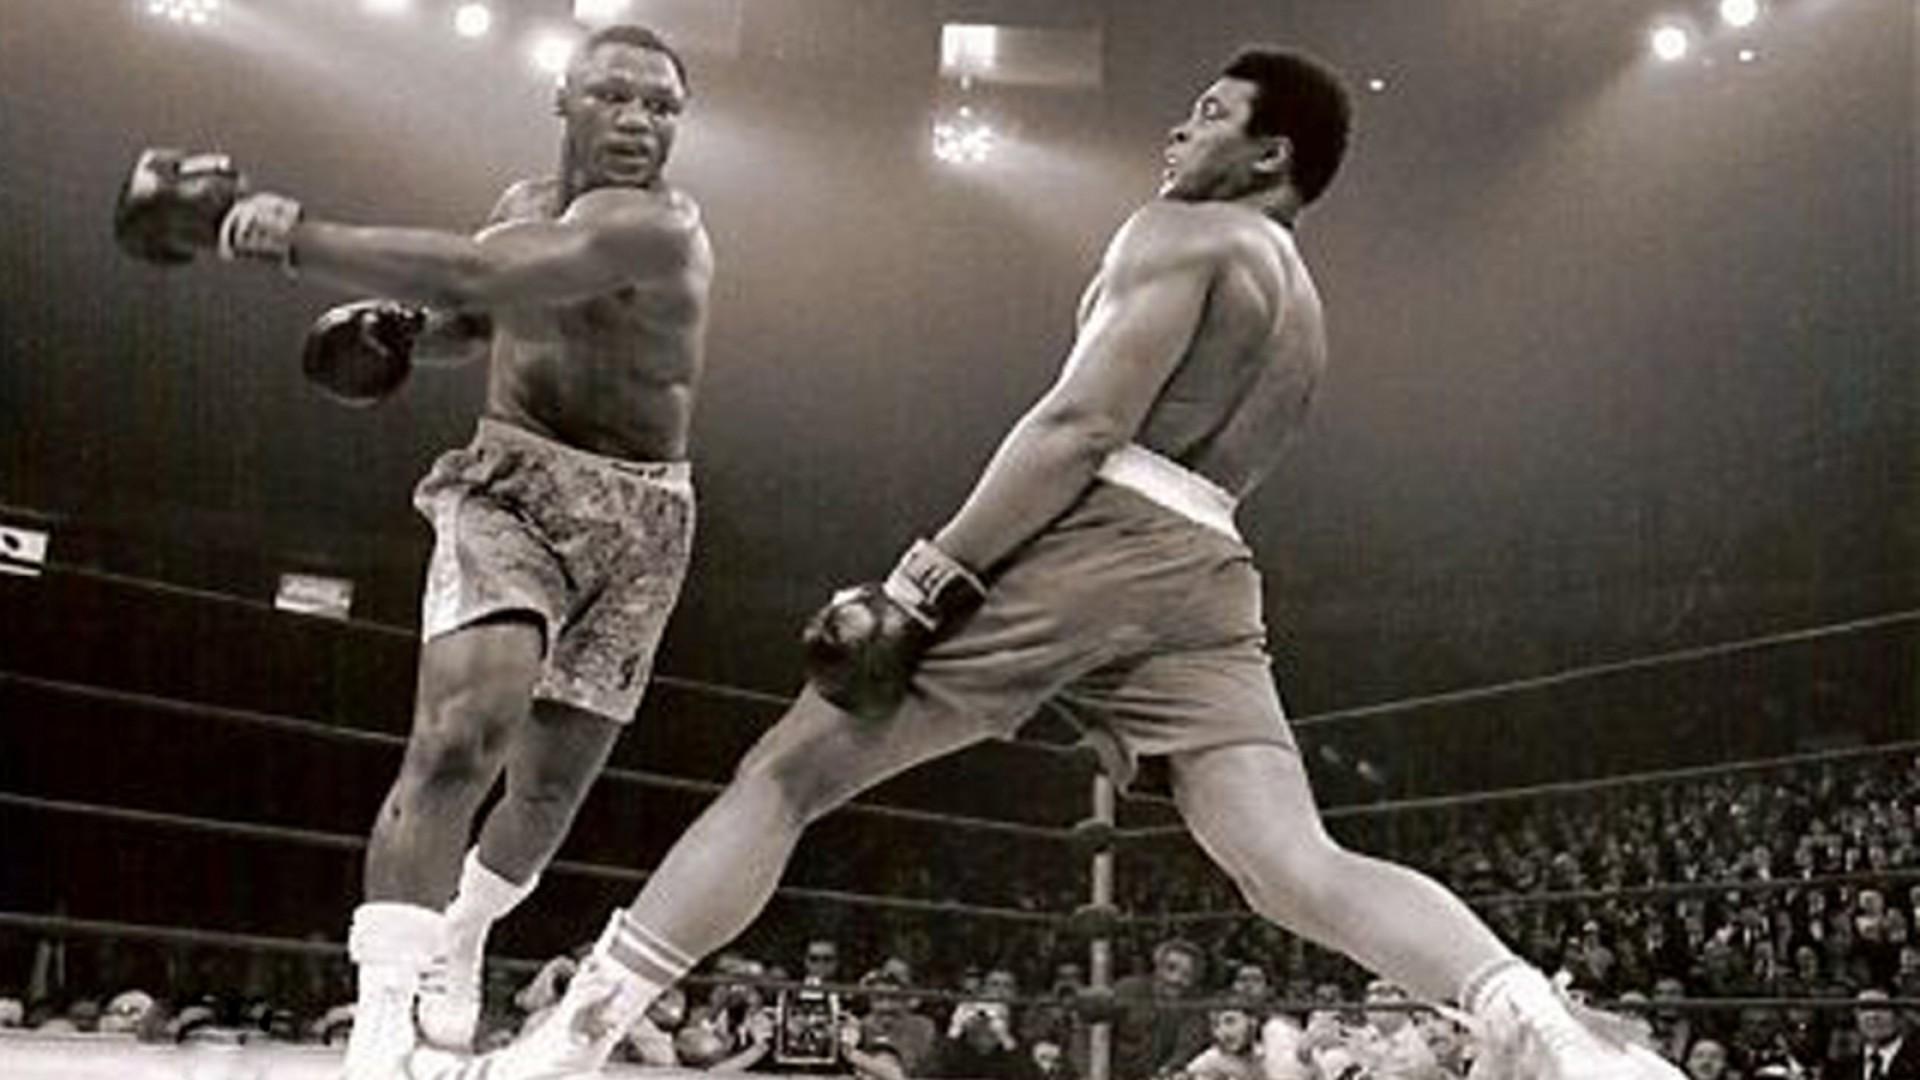 sports boxing muhammad ali 1600×900 wallpaper Art HD Wallpaper